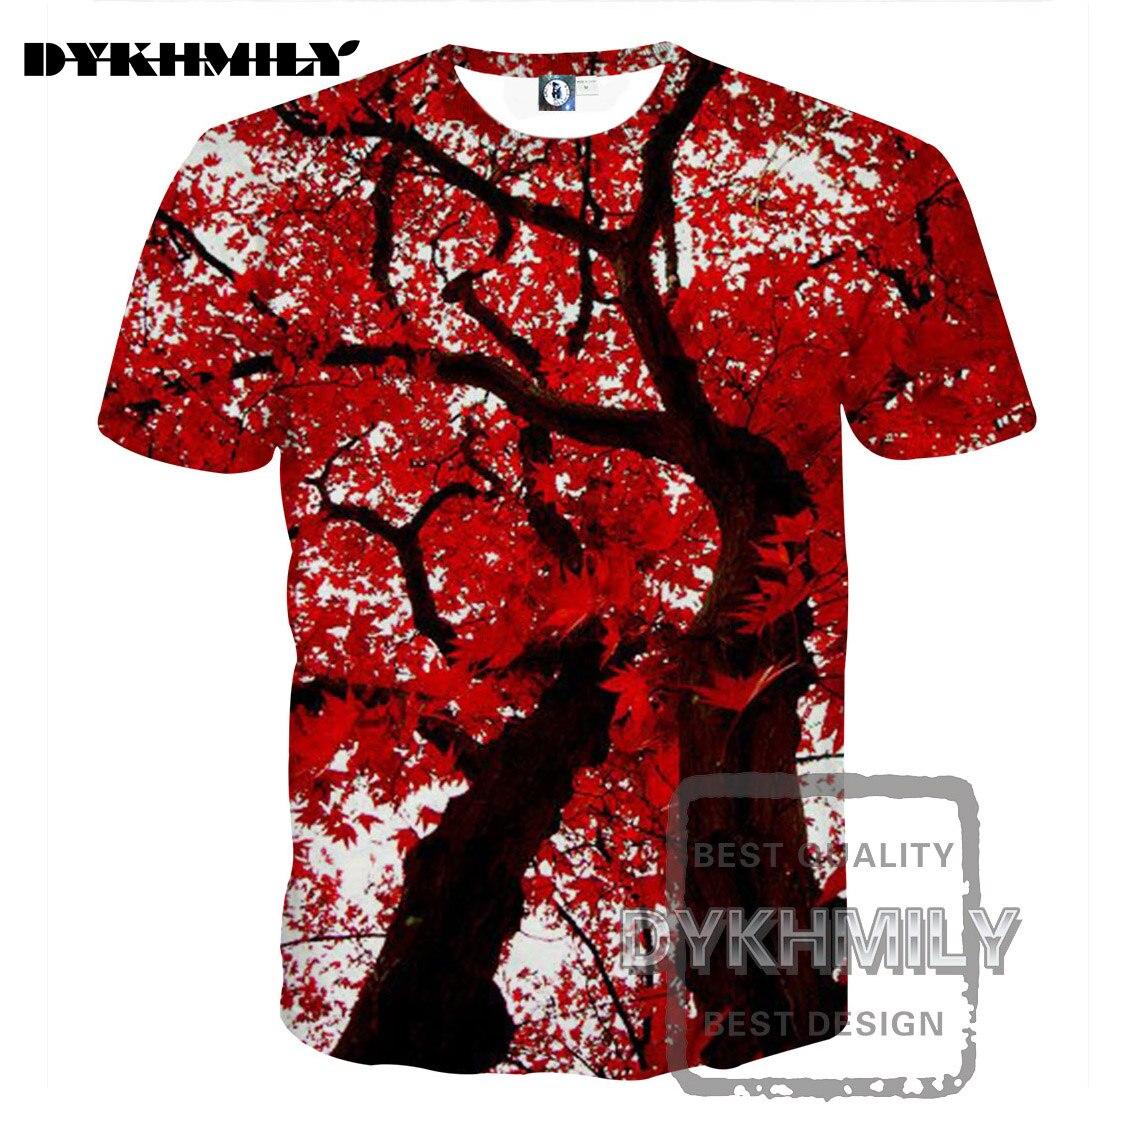 Decorador de arboles de navidad 187 home design 2017 - Dykhmily 2017 Full Print Camiseta Del Verano Tops Impresi N 3d Arce Rbol Del O Cuello